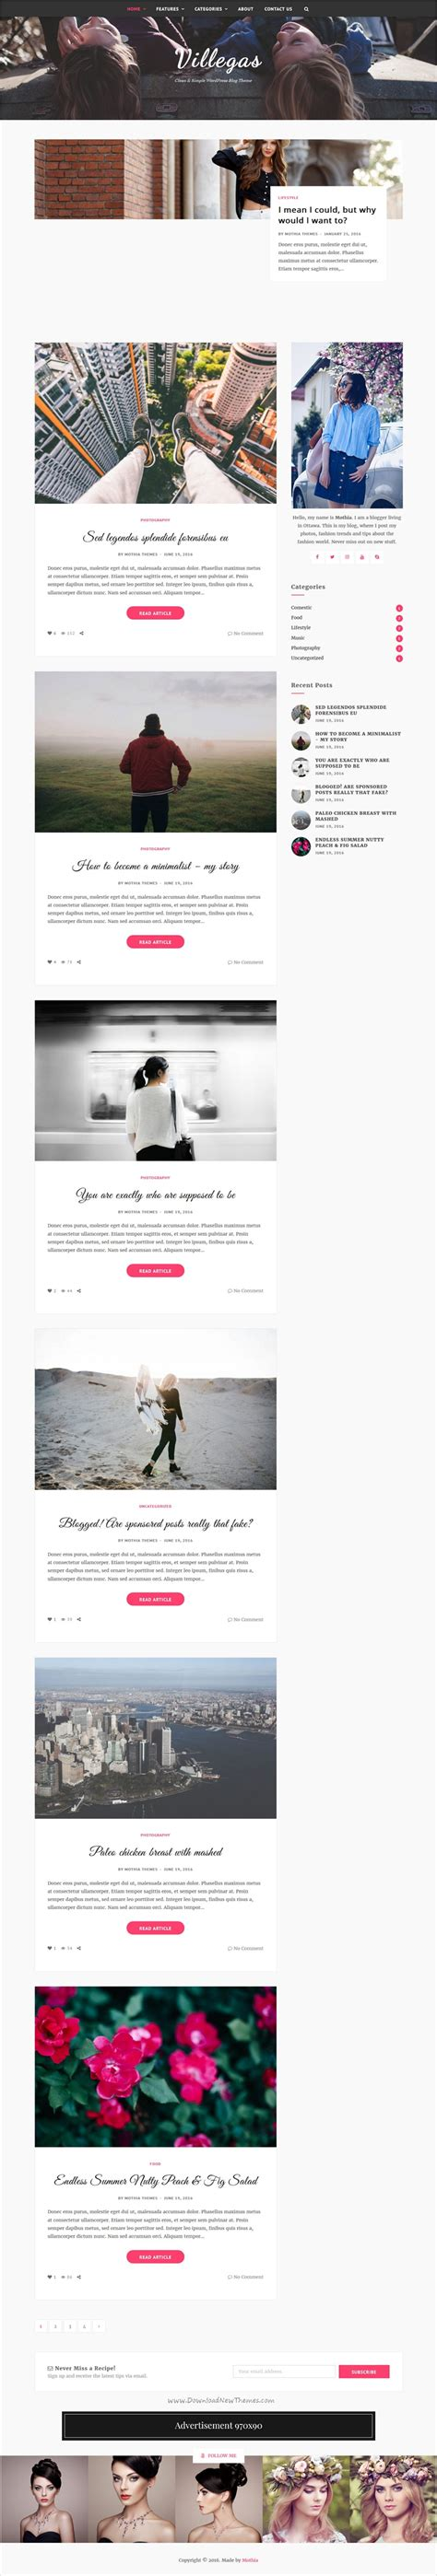 theme ref blog mothia minimal and clean wordpress blog theme